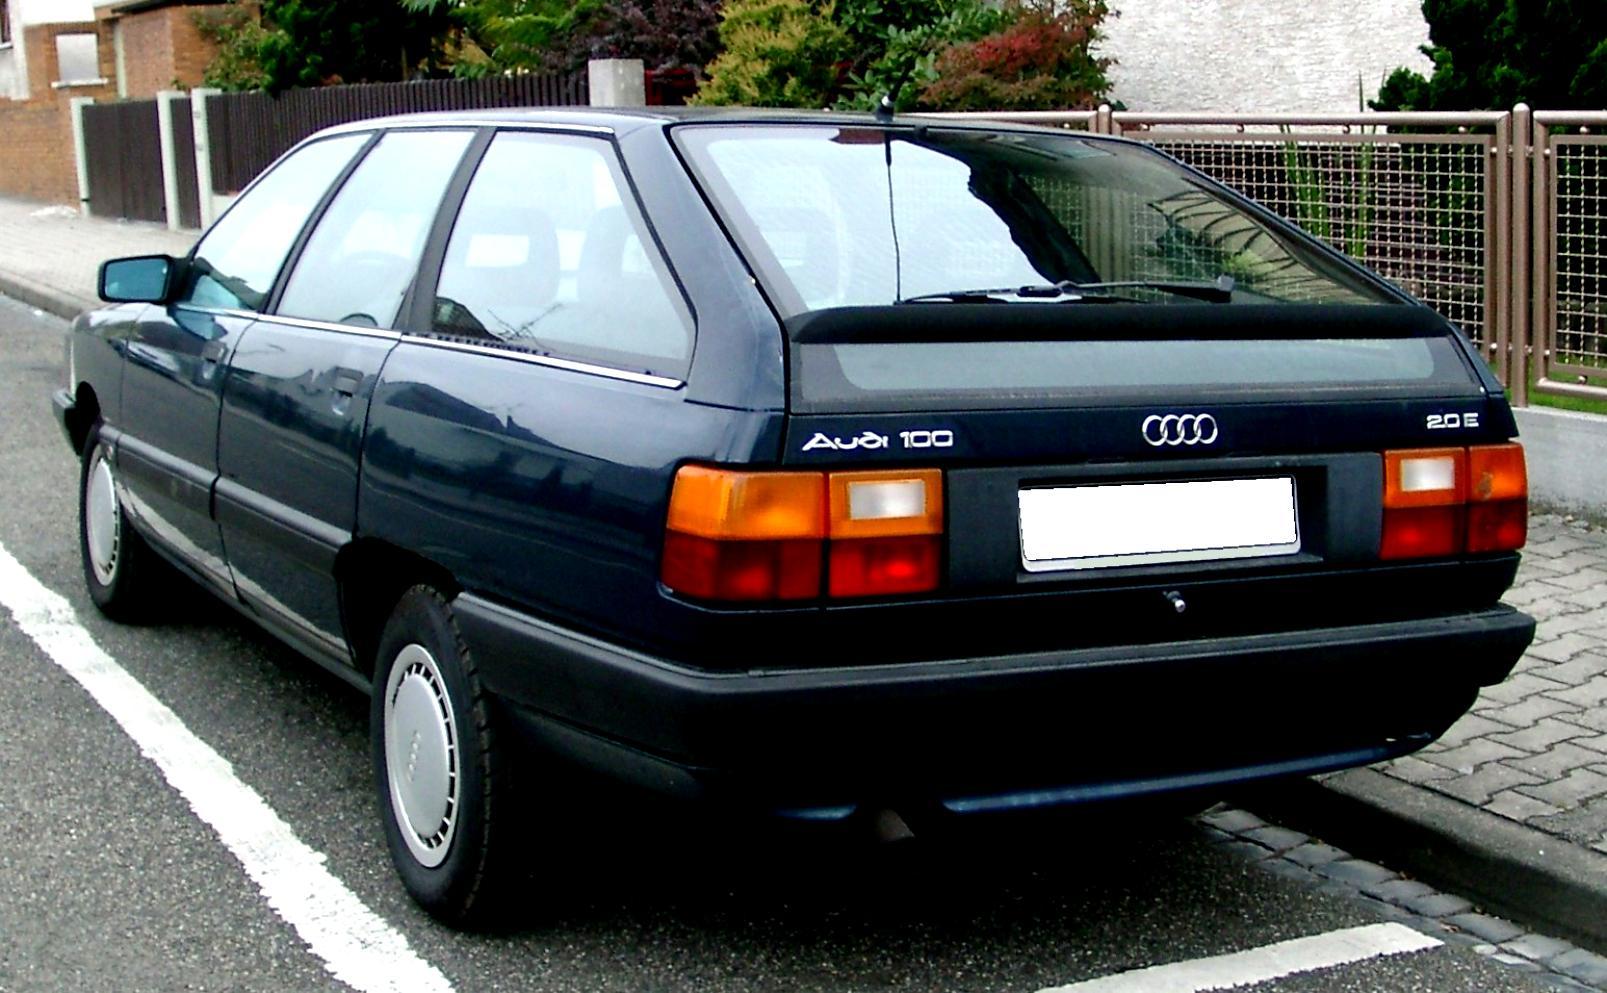 Audi 100 Avant C3 1983 on MotoImg.com